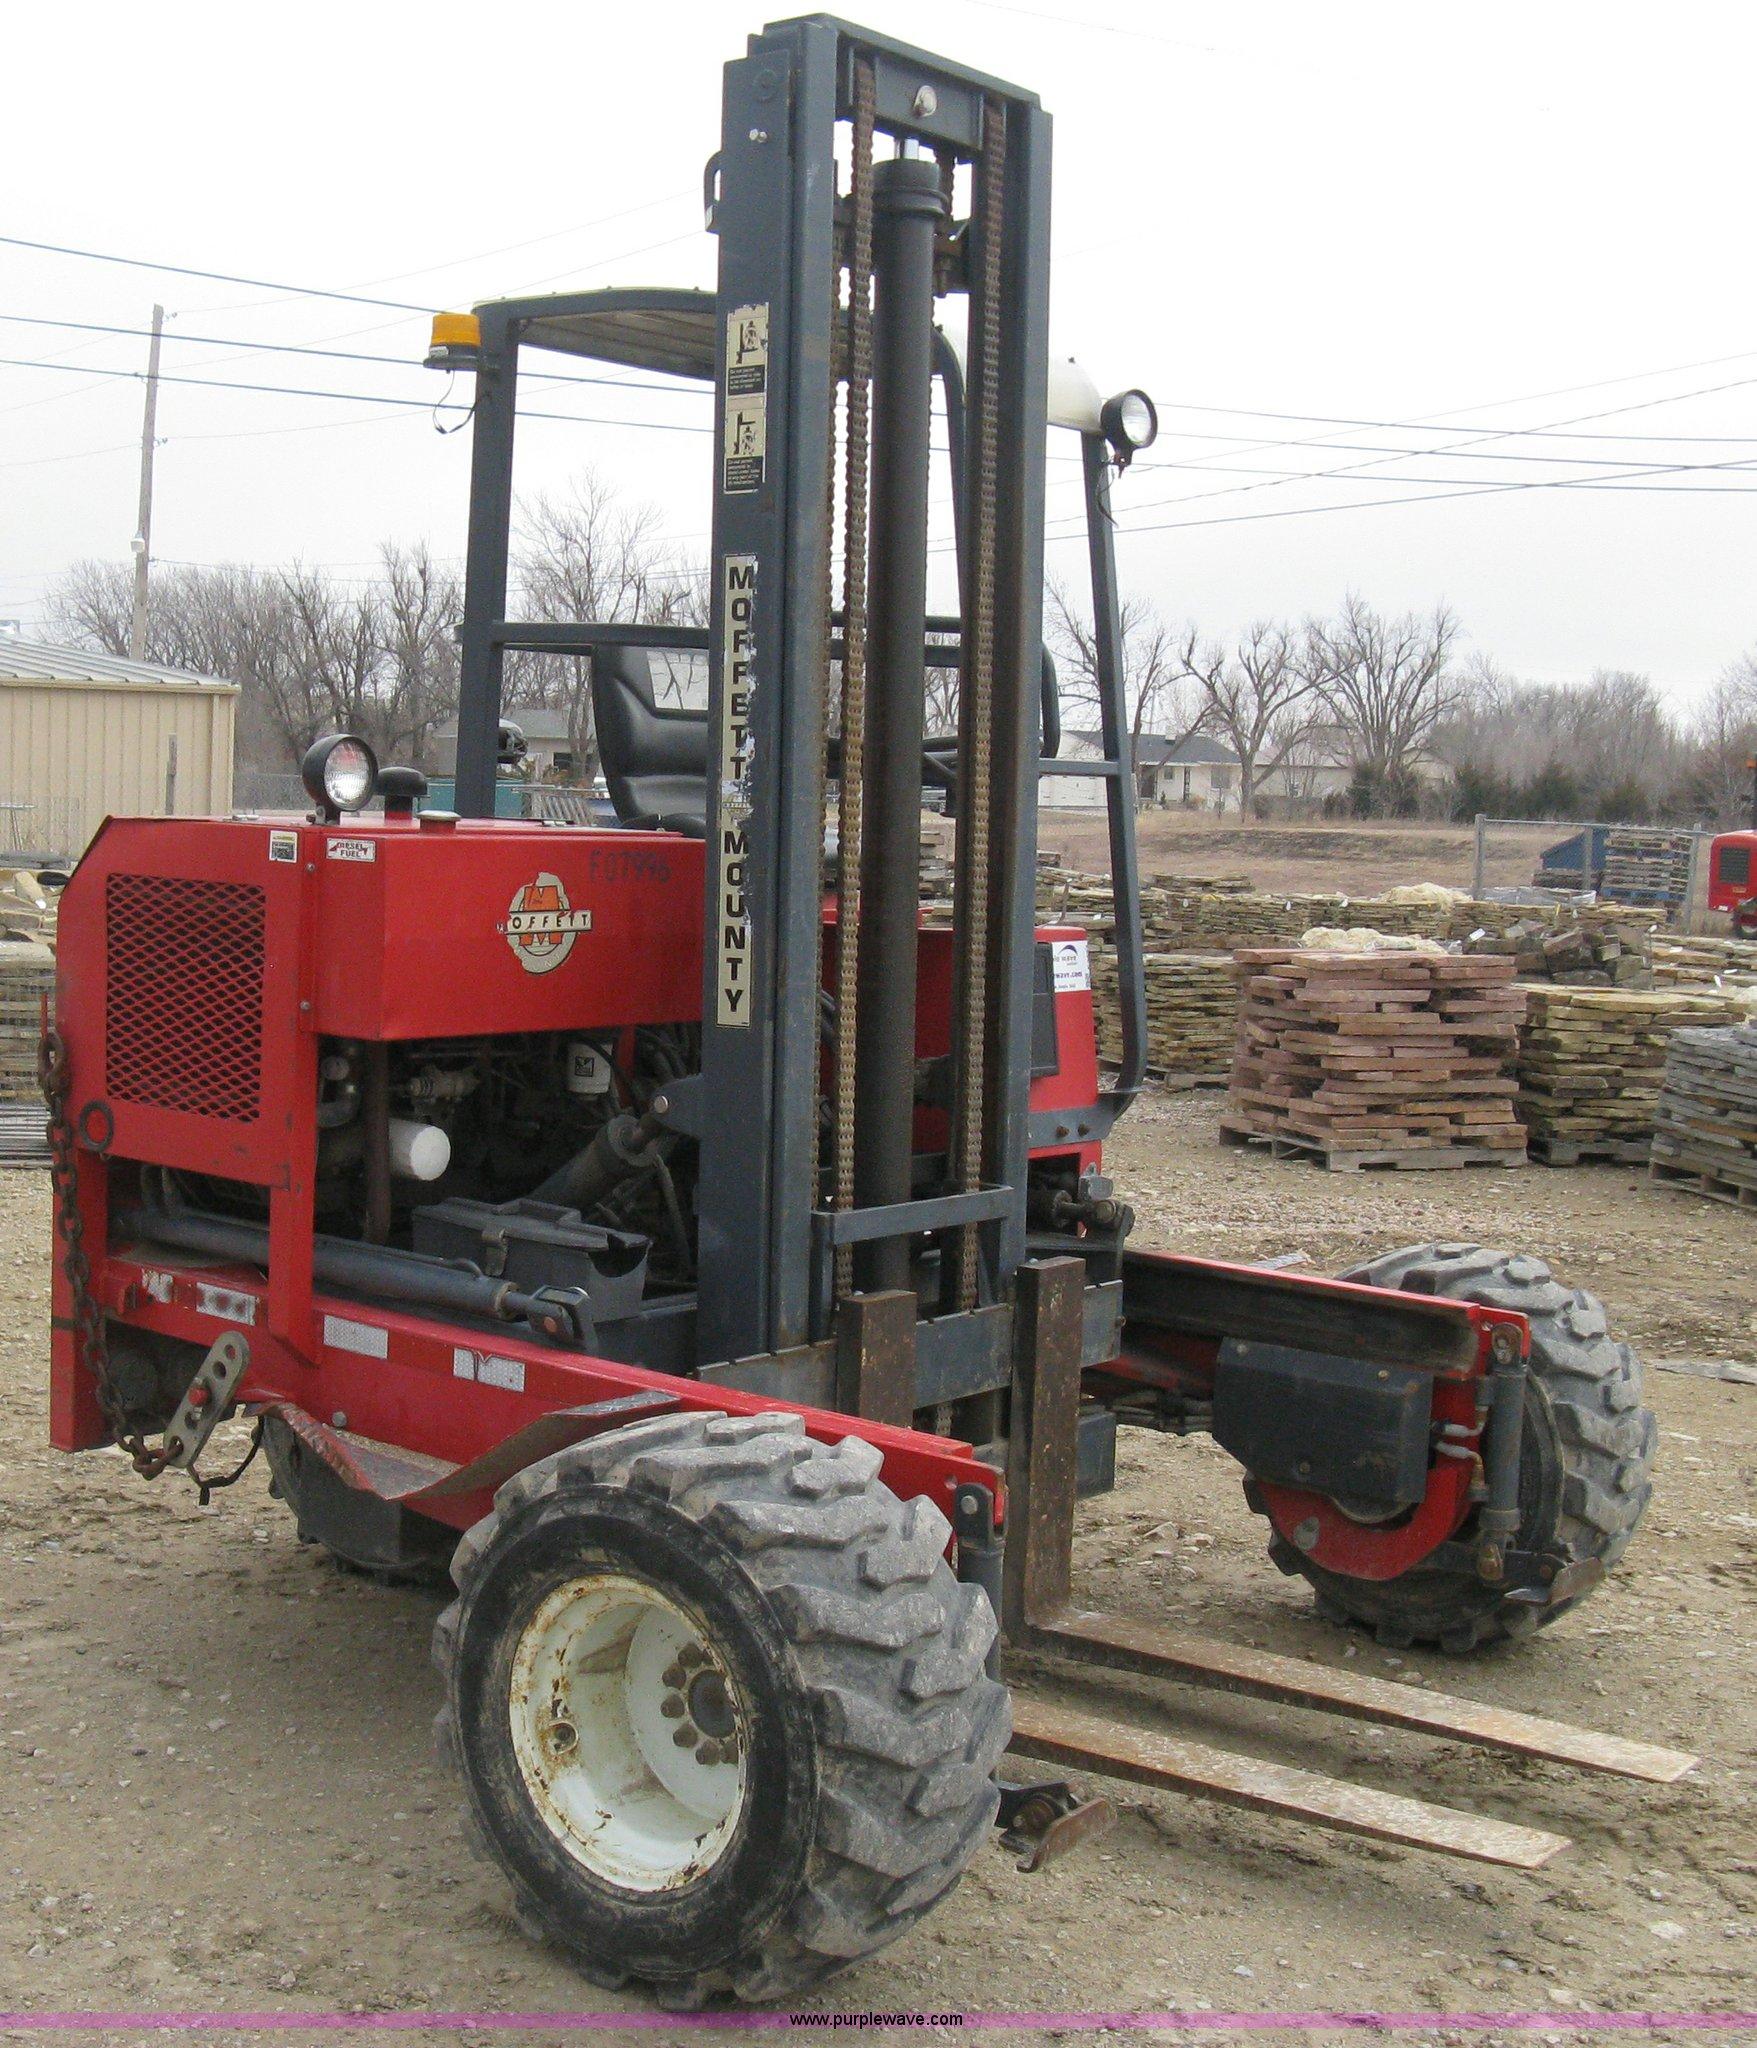 1997 moffett m5000 piggy back forklift item e3077 sold rh purplewave com Moffett Forklift Parts Diagram Moffett Forklift Hydraulic Diagrams